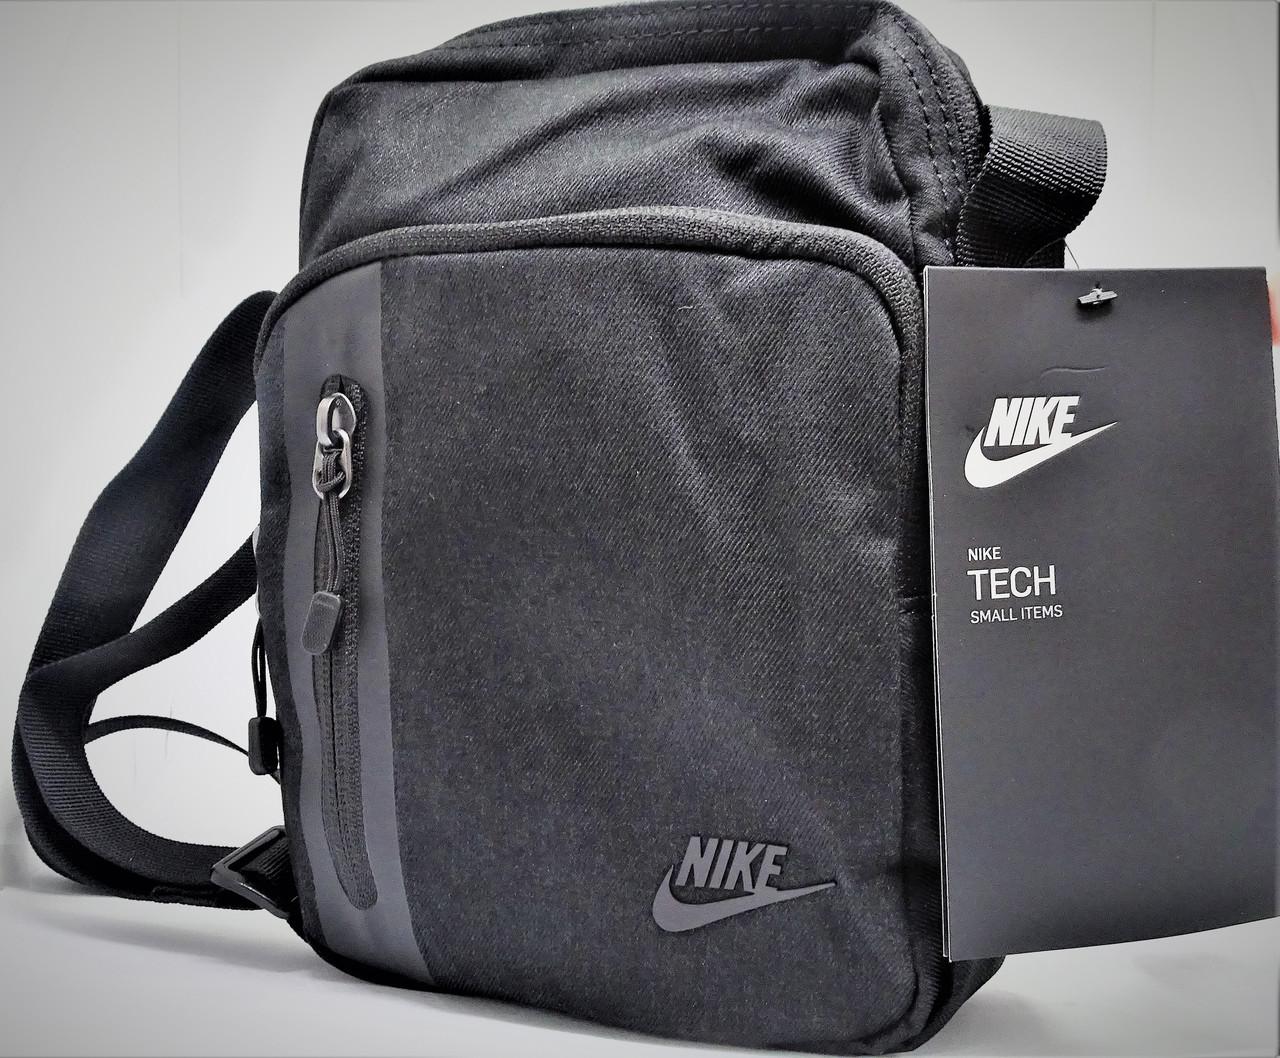 8d075c09d3e2 Сумка мужская через плечо Nike Core Small Items 3.0 - vectorsport в Виннице